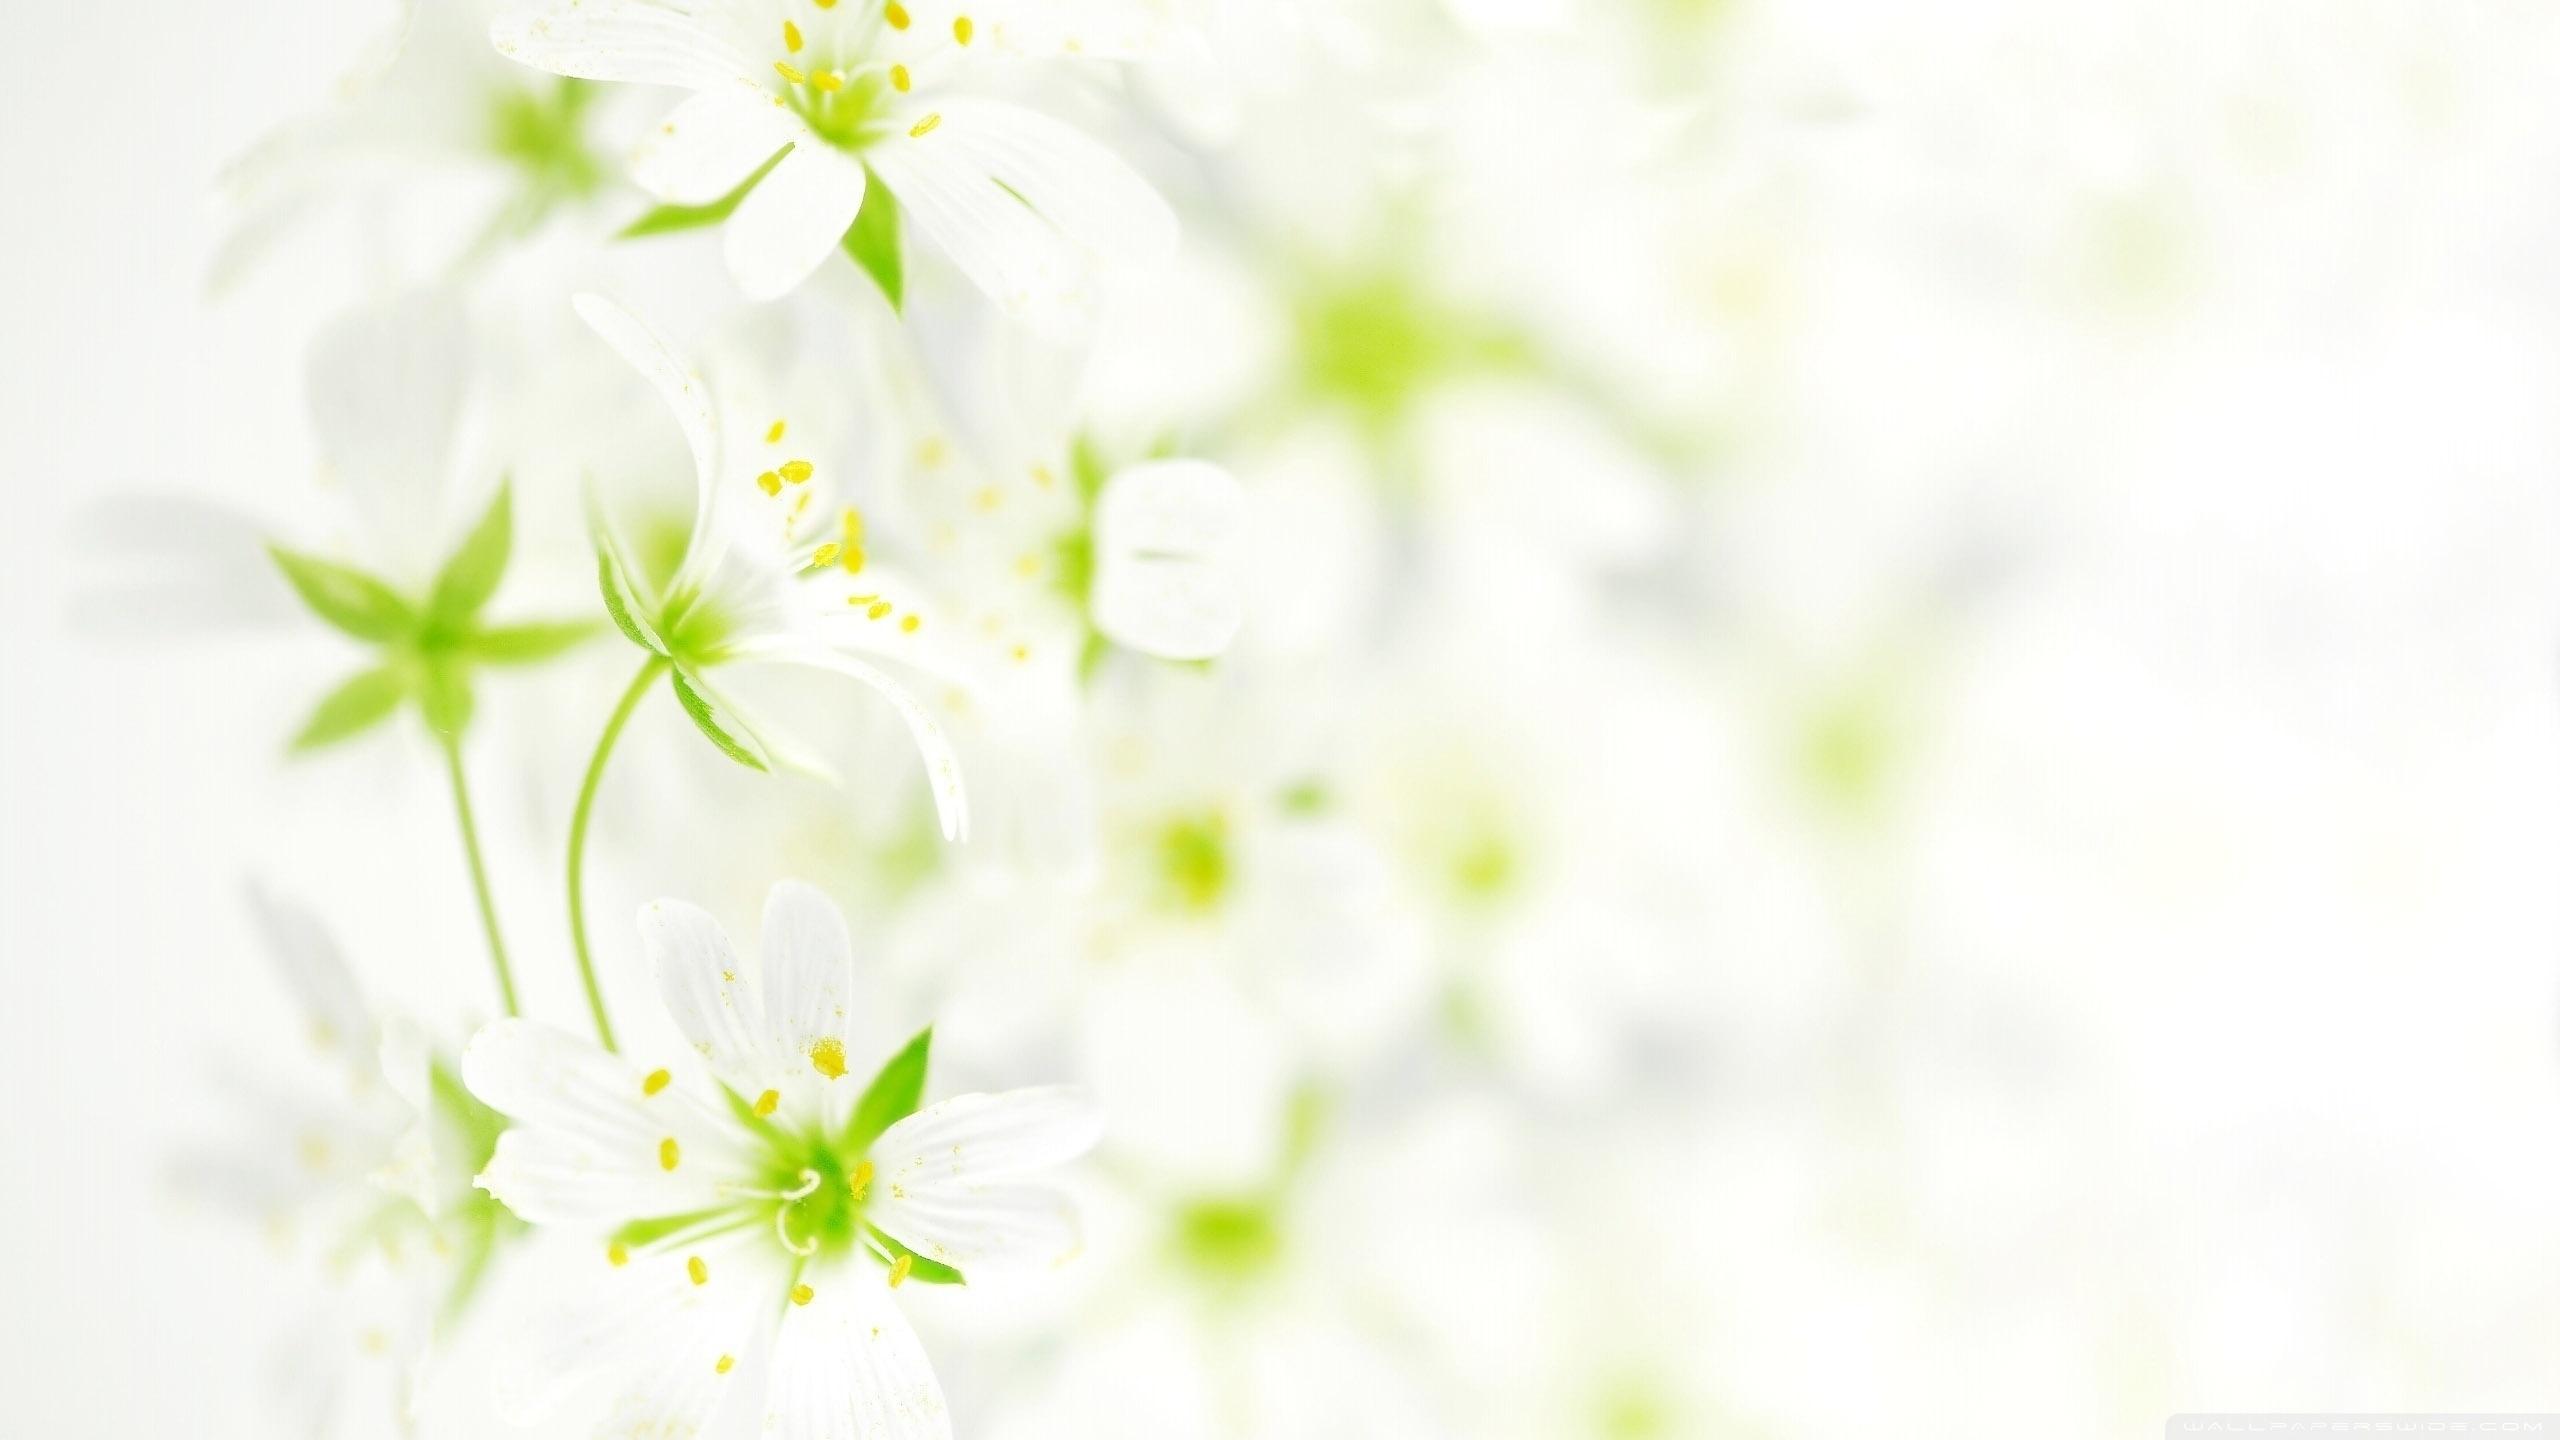 blurred white flowers ❤ 4k hd desktop wallpaper for 4k ultra hd tv